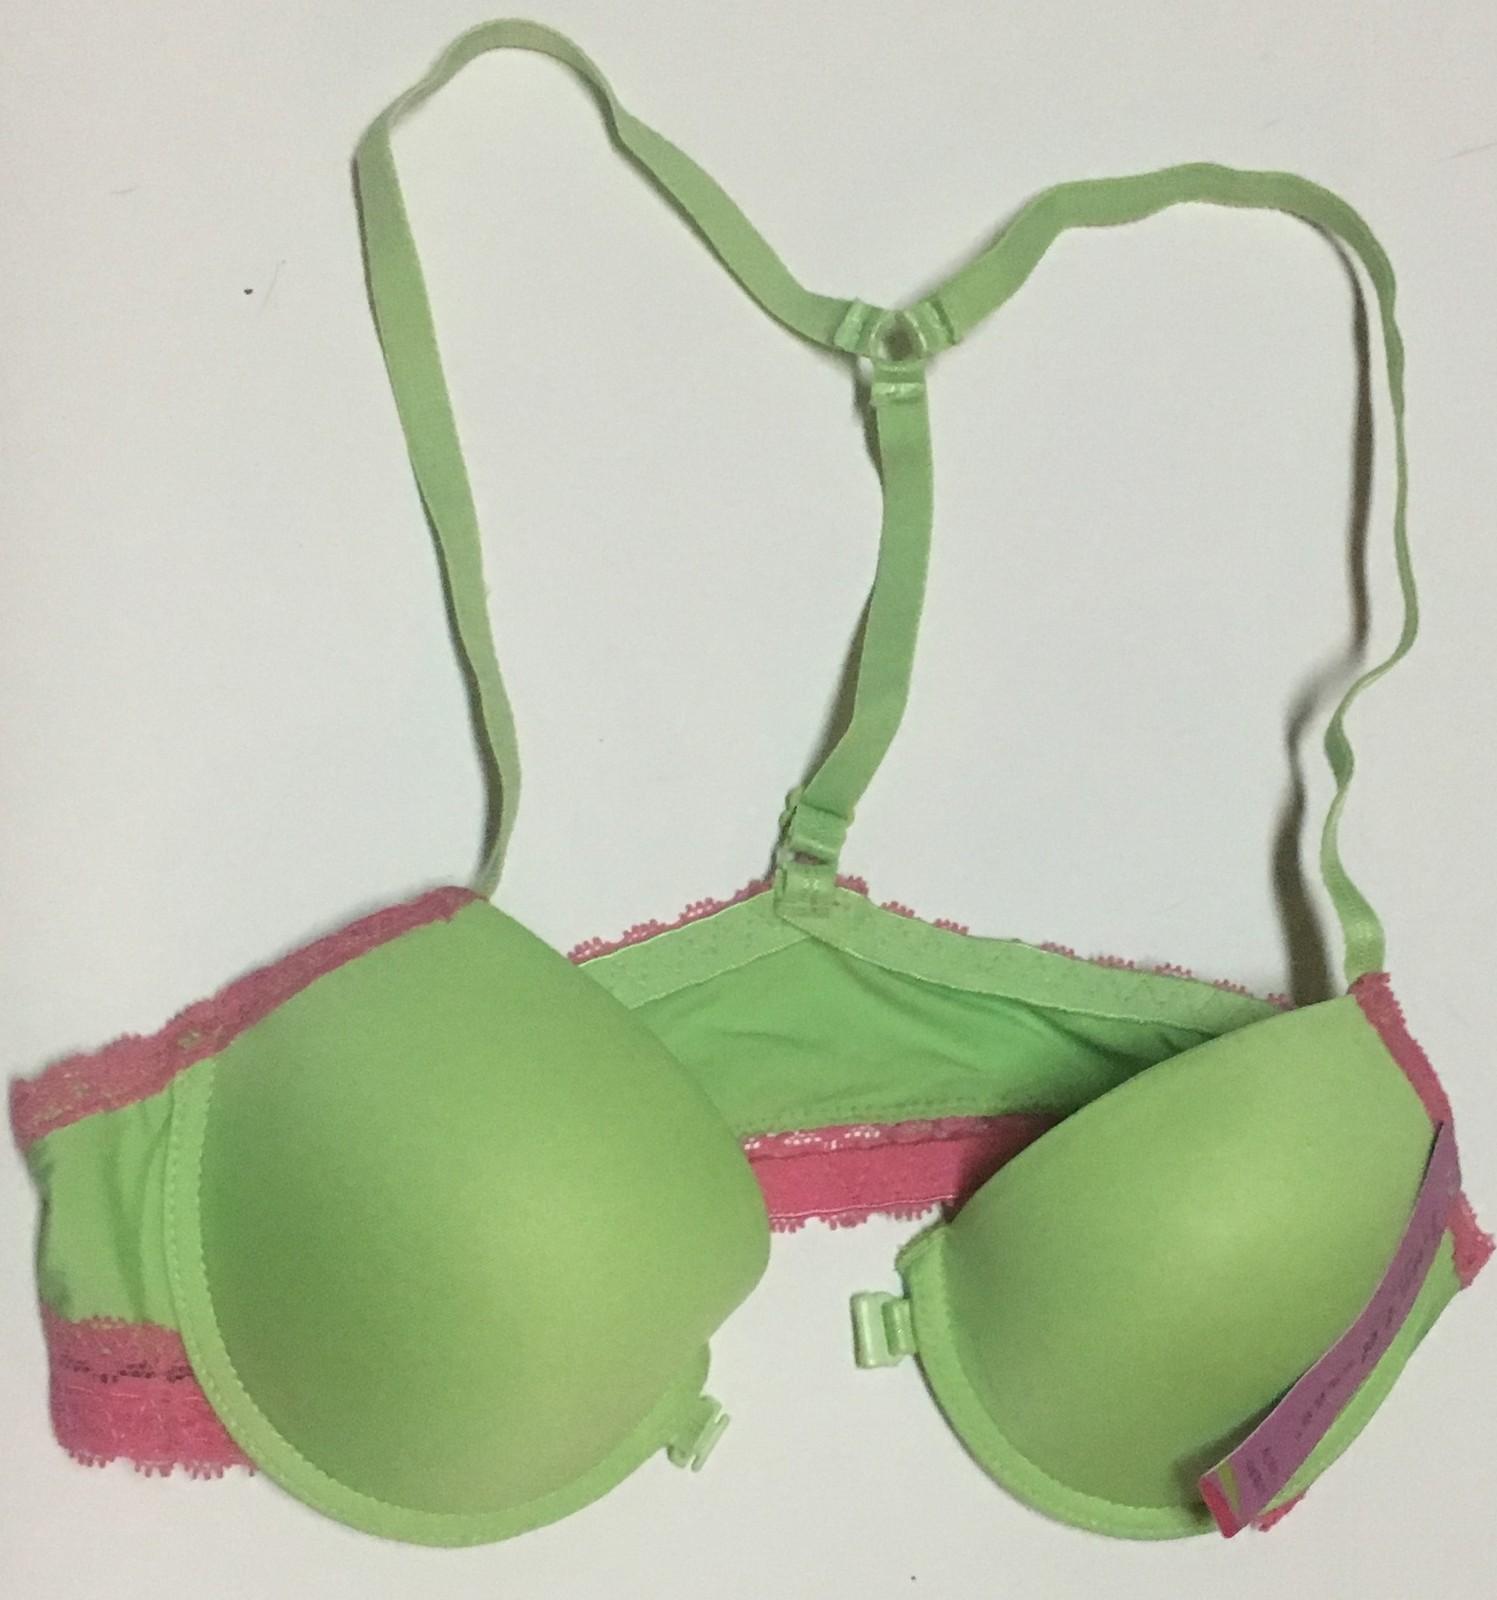 Lais L'd Bras Padded Lime Green w/Pink Lace Sz 34A